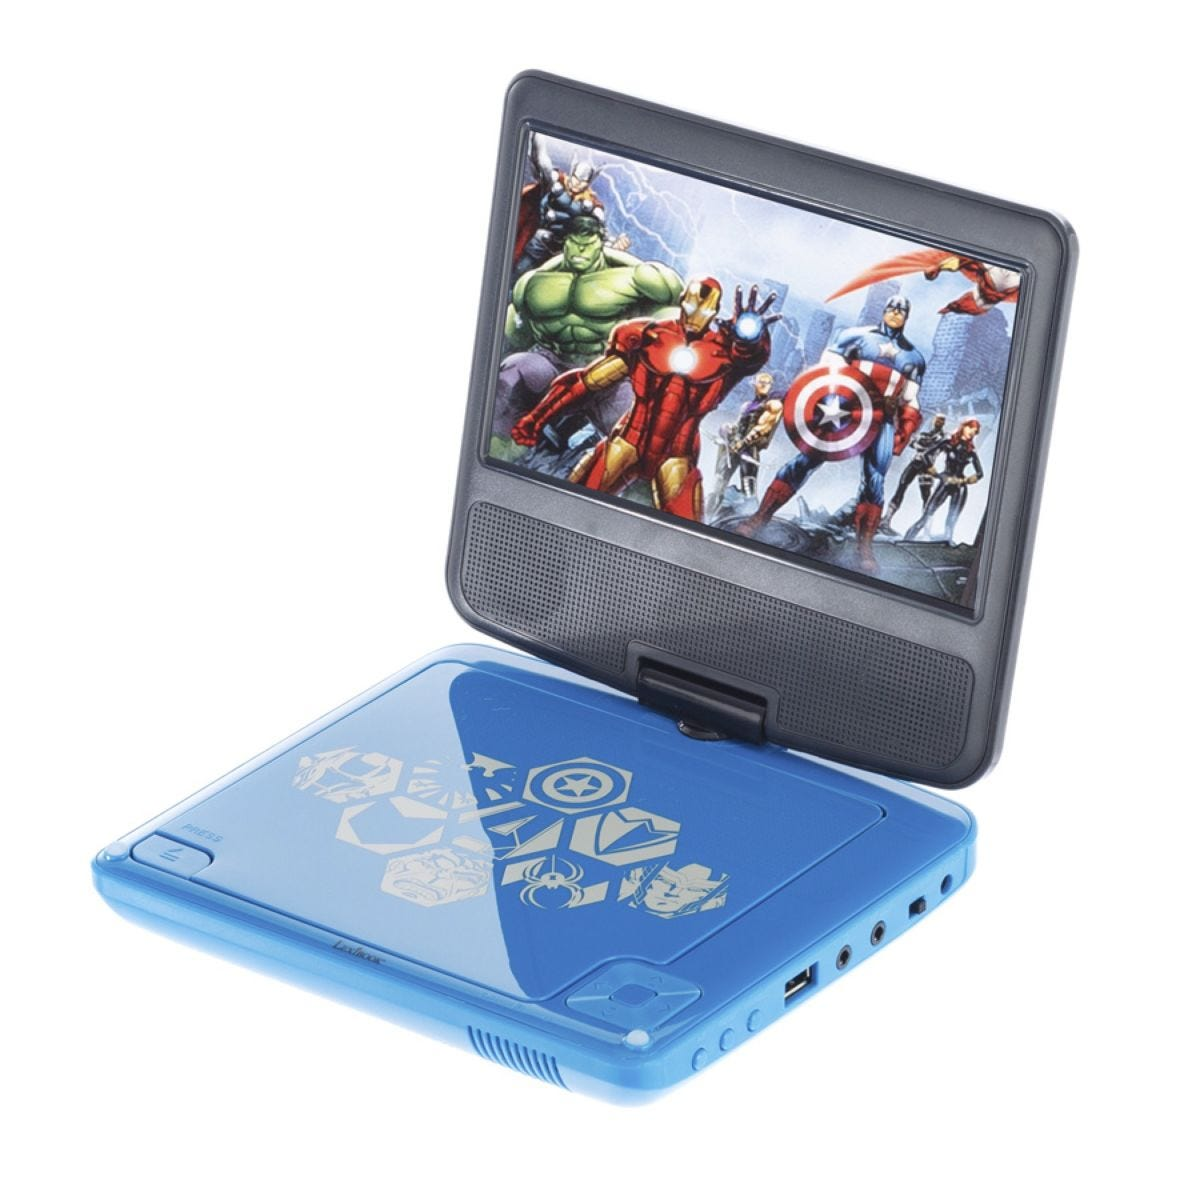 Lexibook Avengers Portable DVD Player